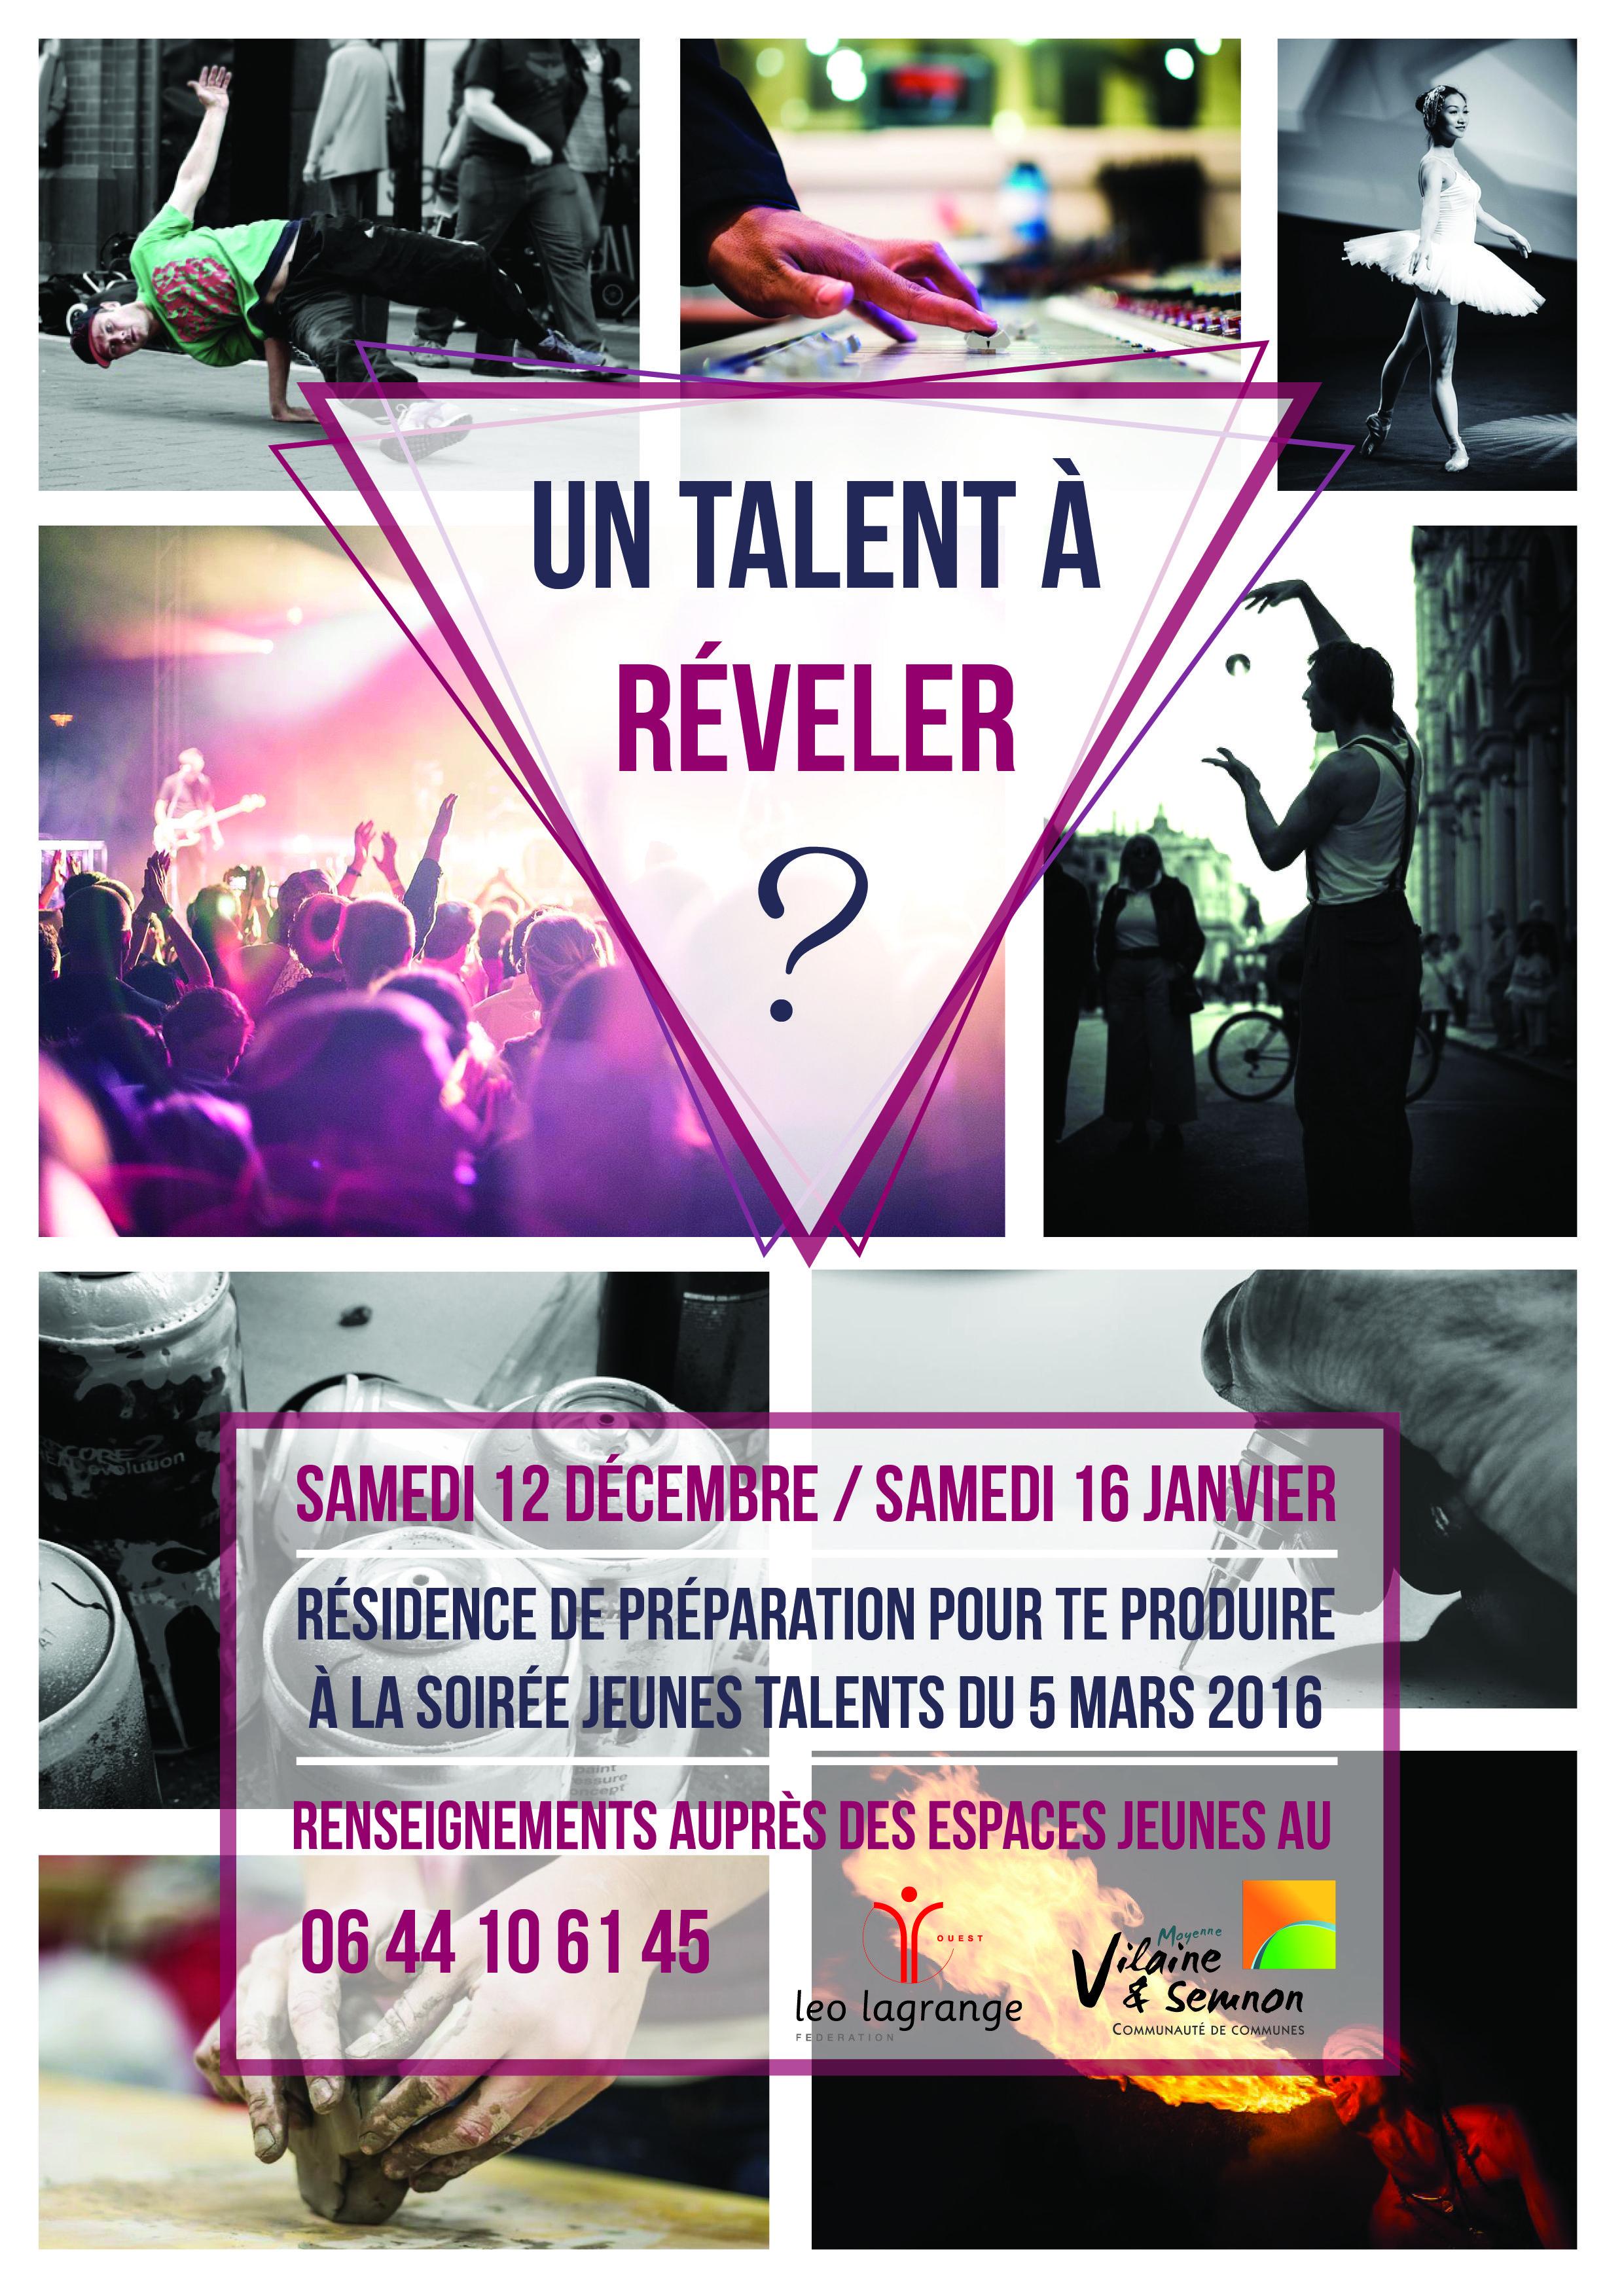 triangle #talent #concert #street #art #feu #magie #musique #son